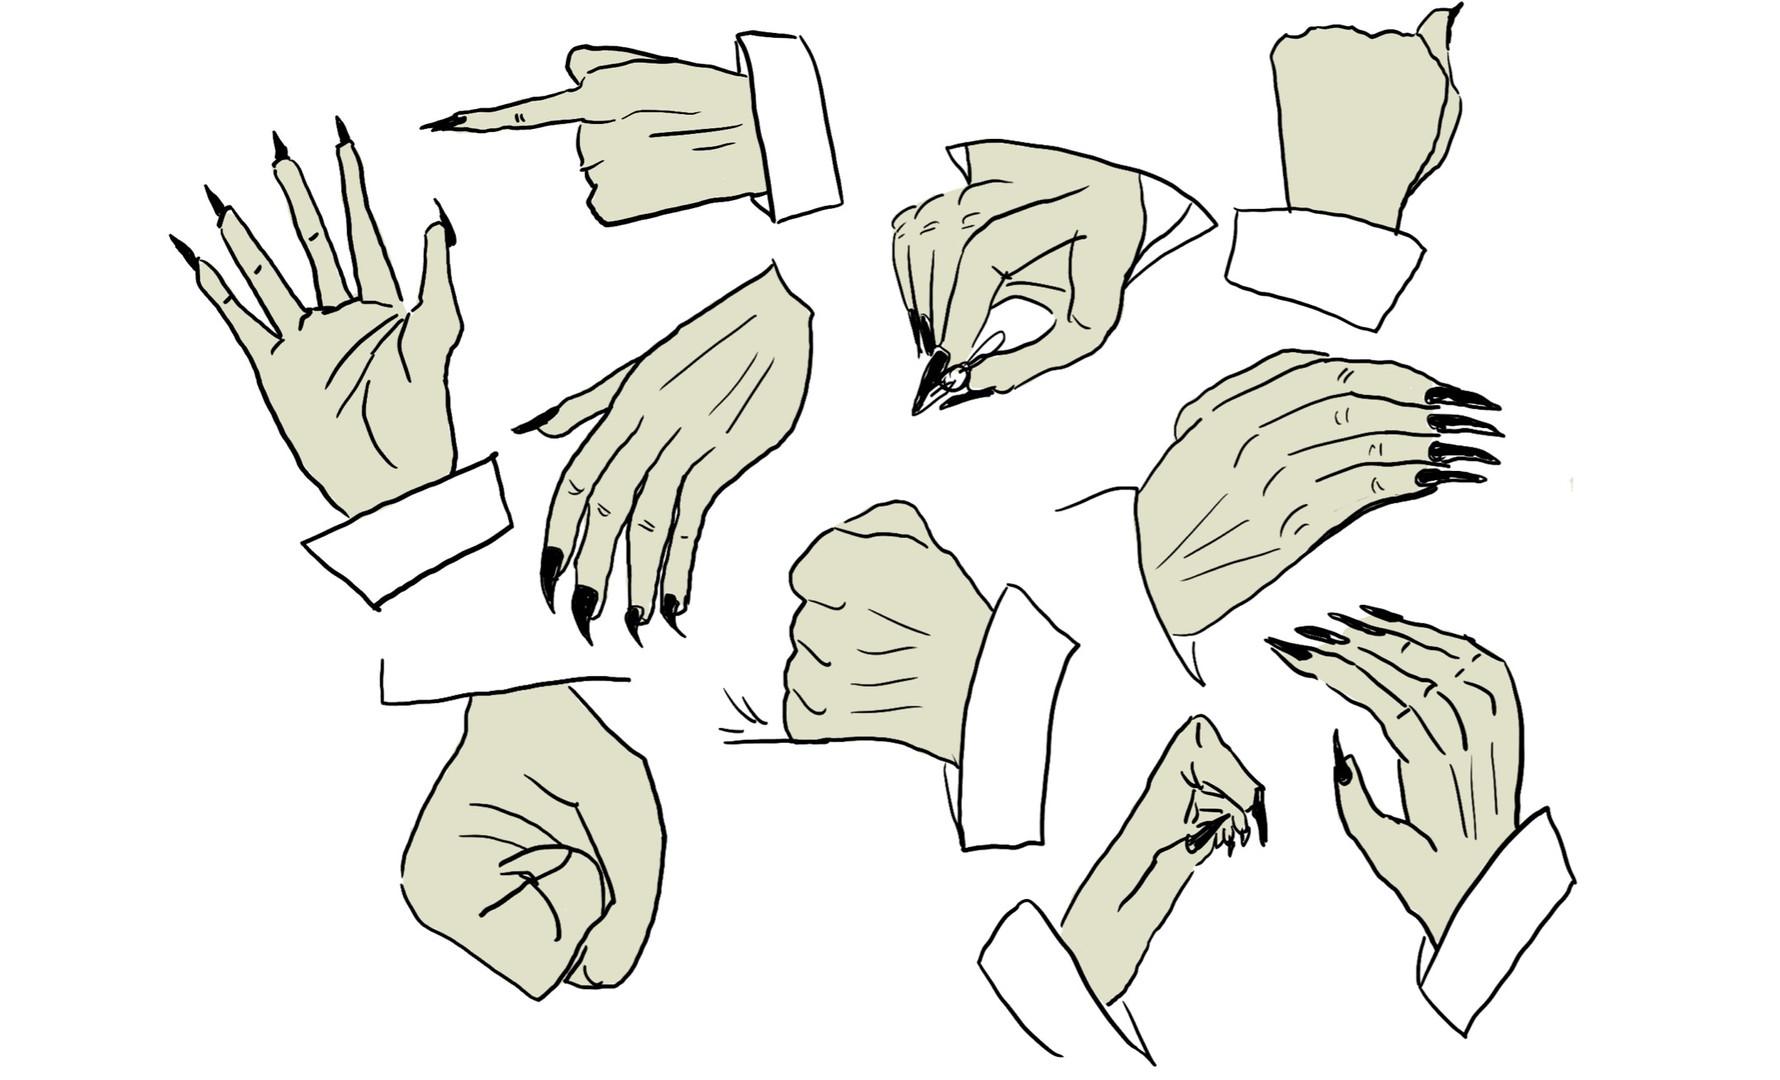 Batthew - Hand pose sheet